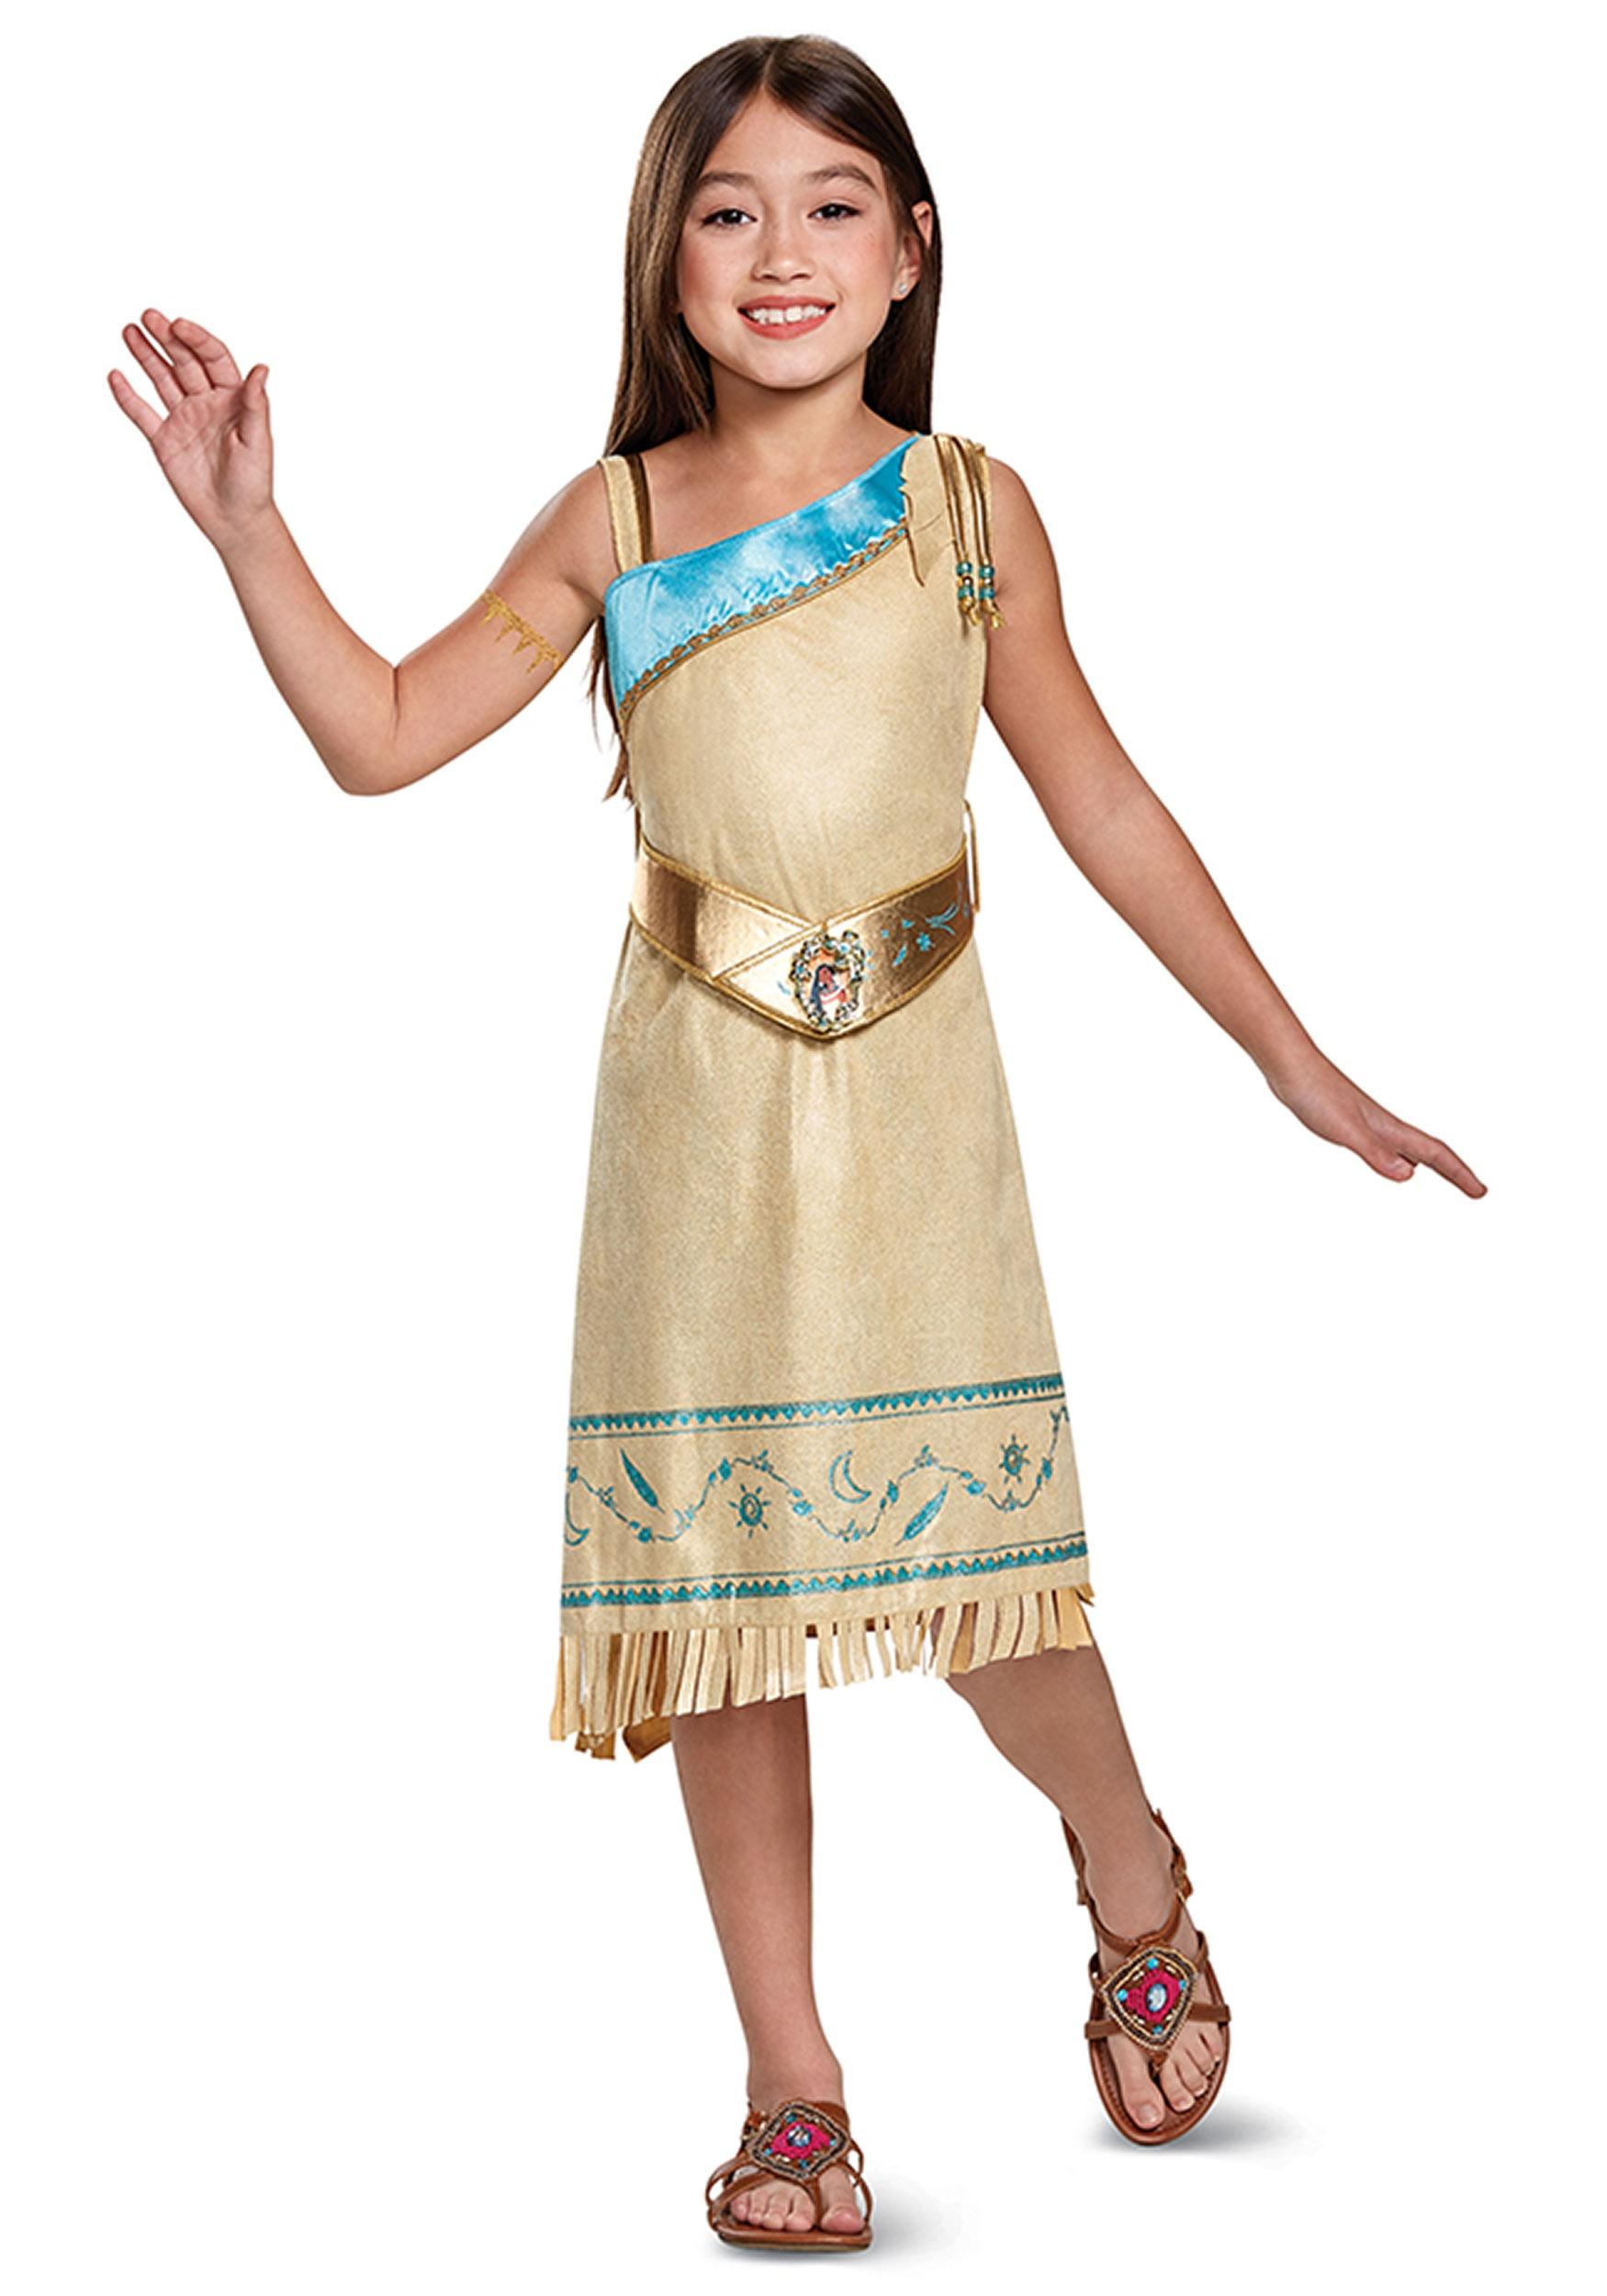 Girls Pocahontas Deluxe Costume  sc 1 st  Halloween Costumes & Pocahontas Deluxe Child Costume